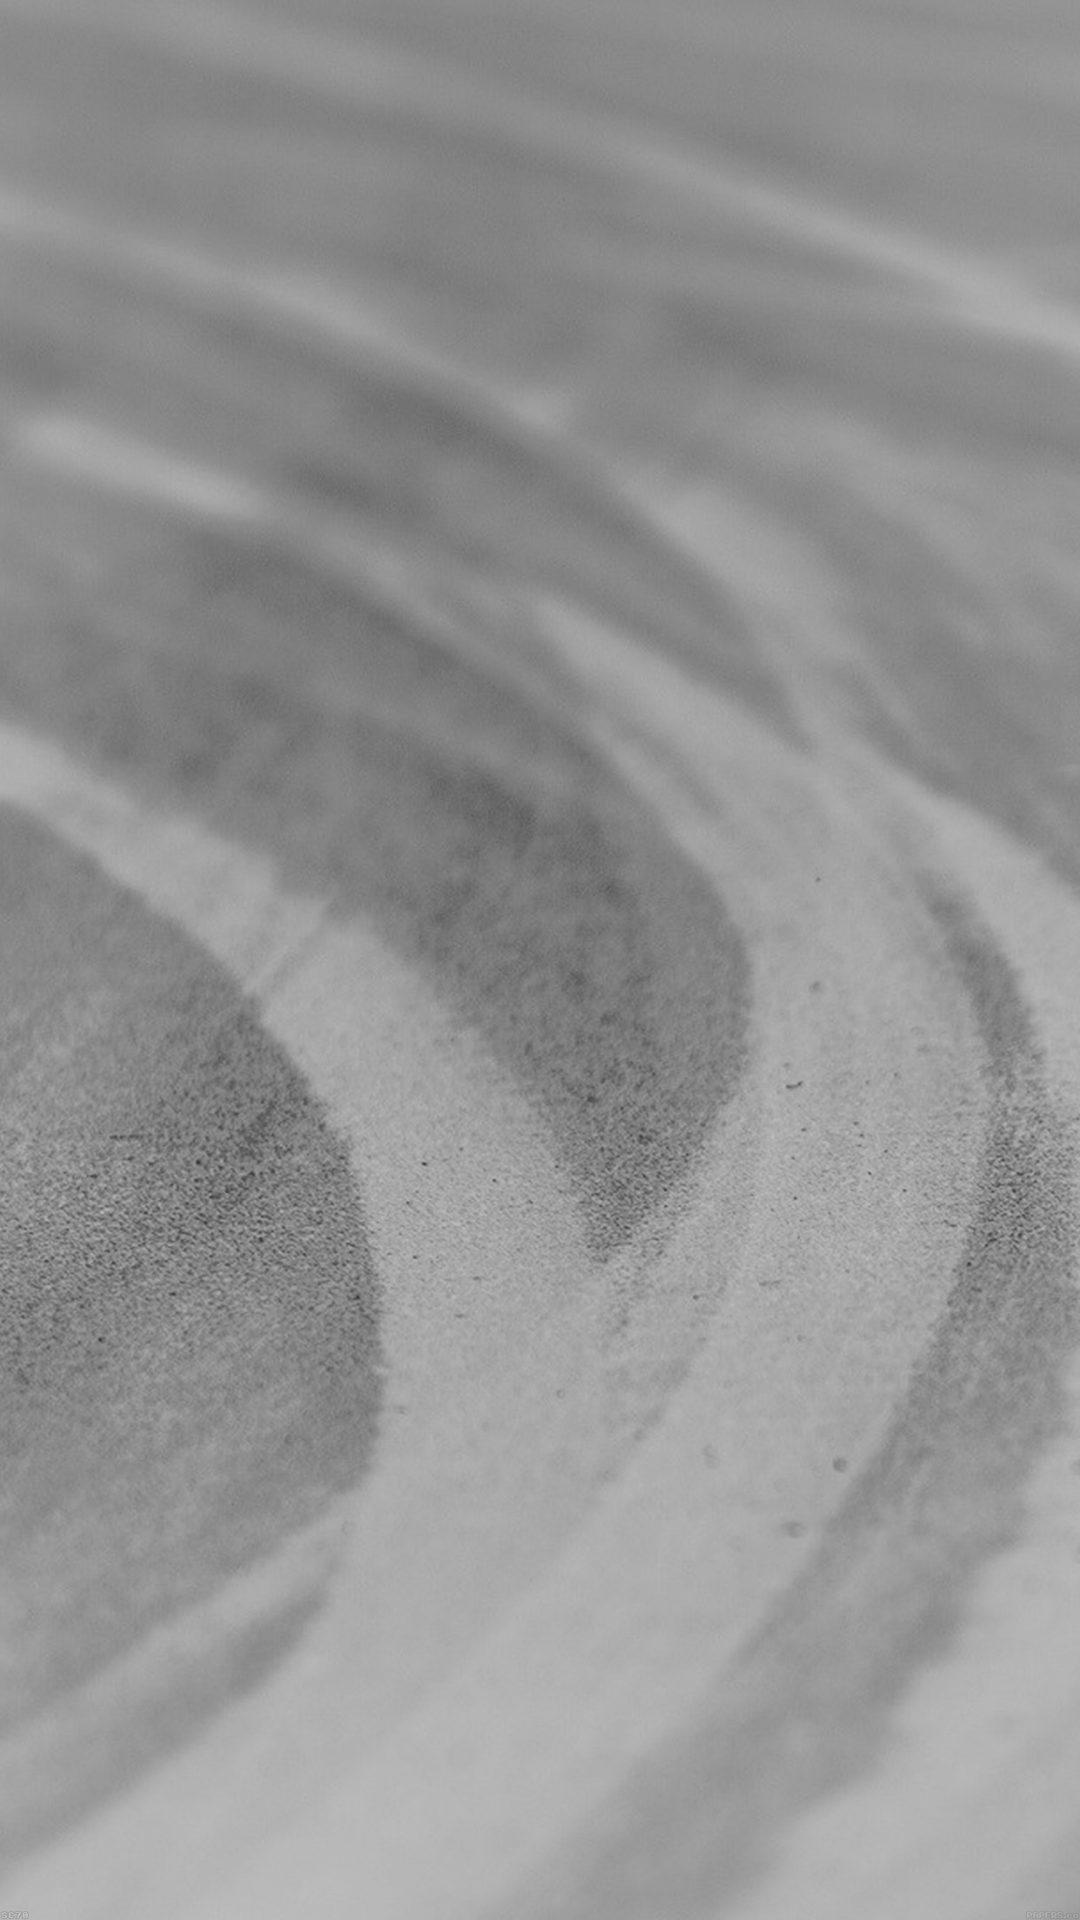 Aspalt Hd Skid Marks Nature Pattern White